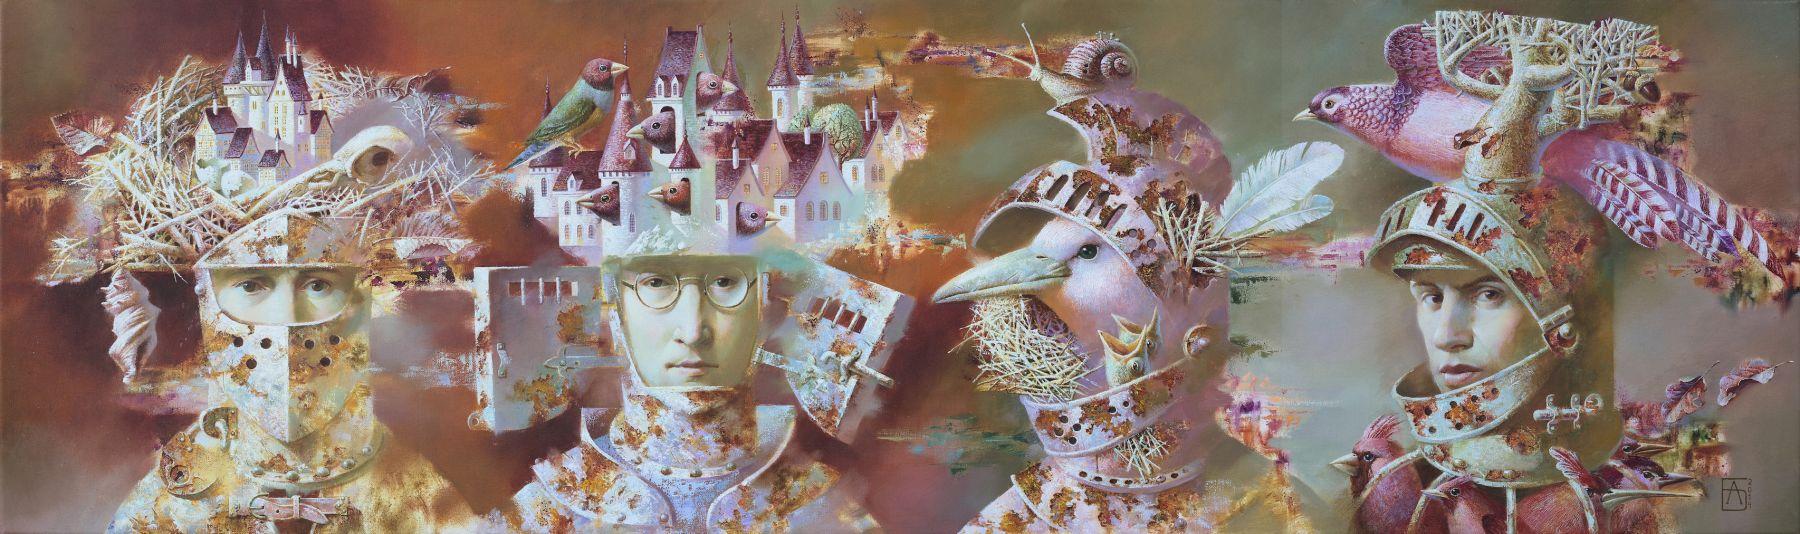 Anna Berezovskaya_Four Knights